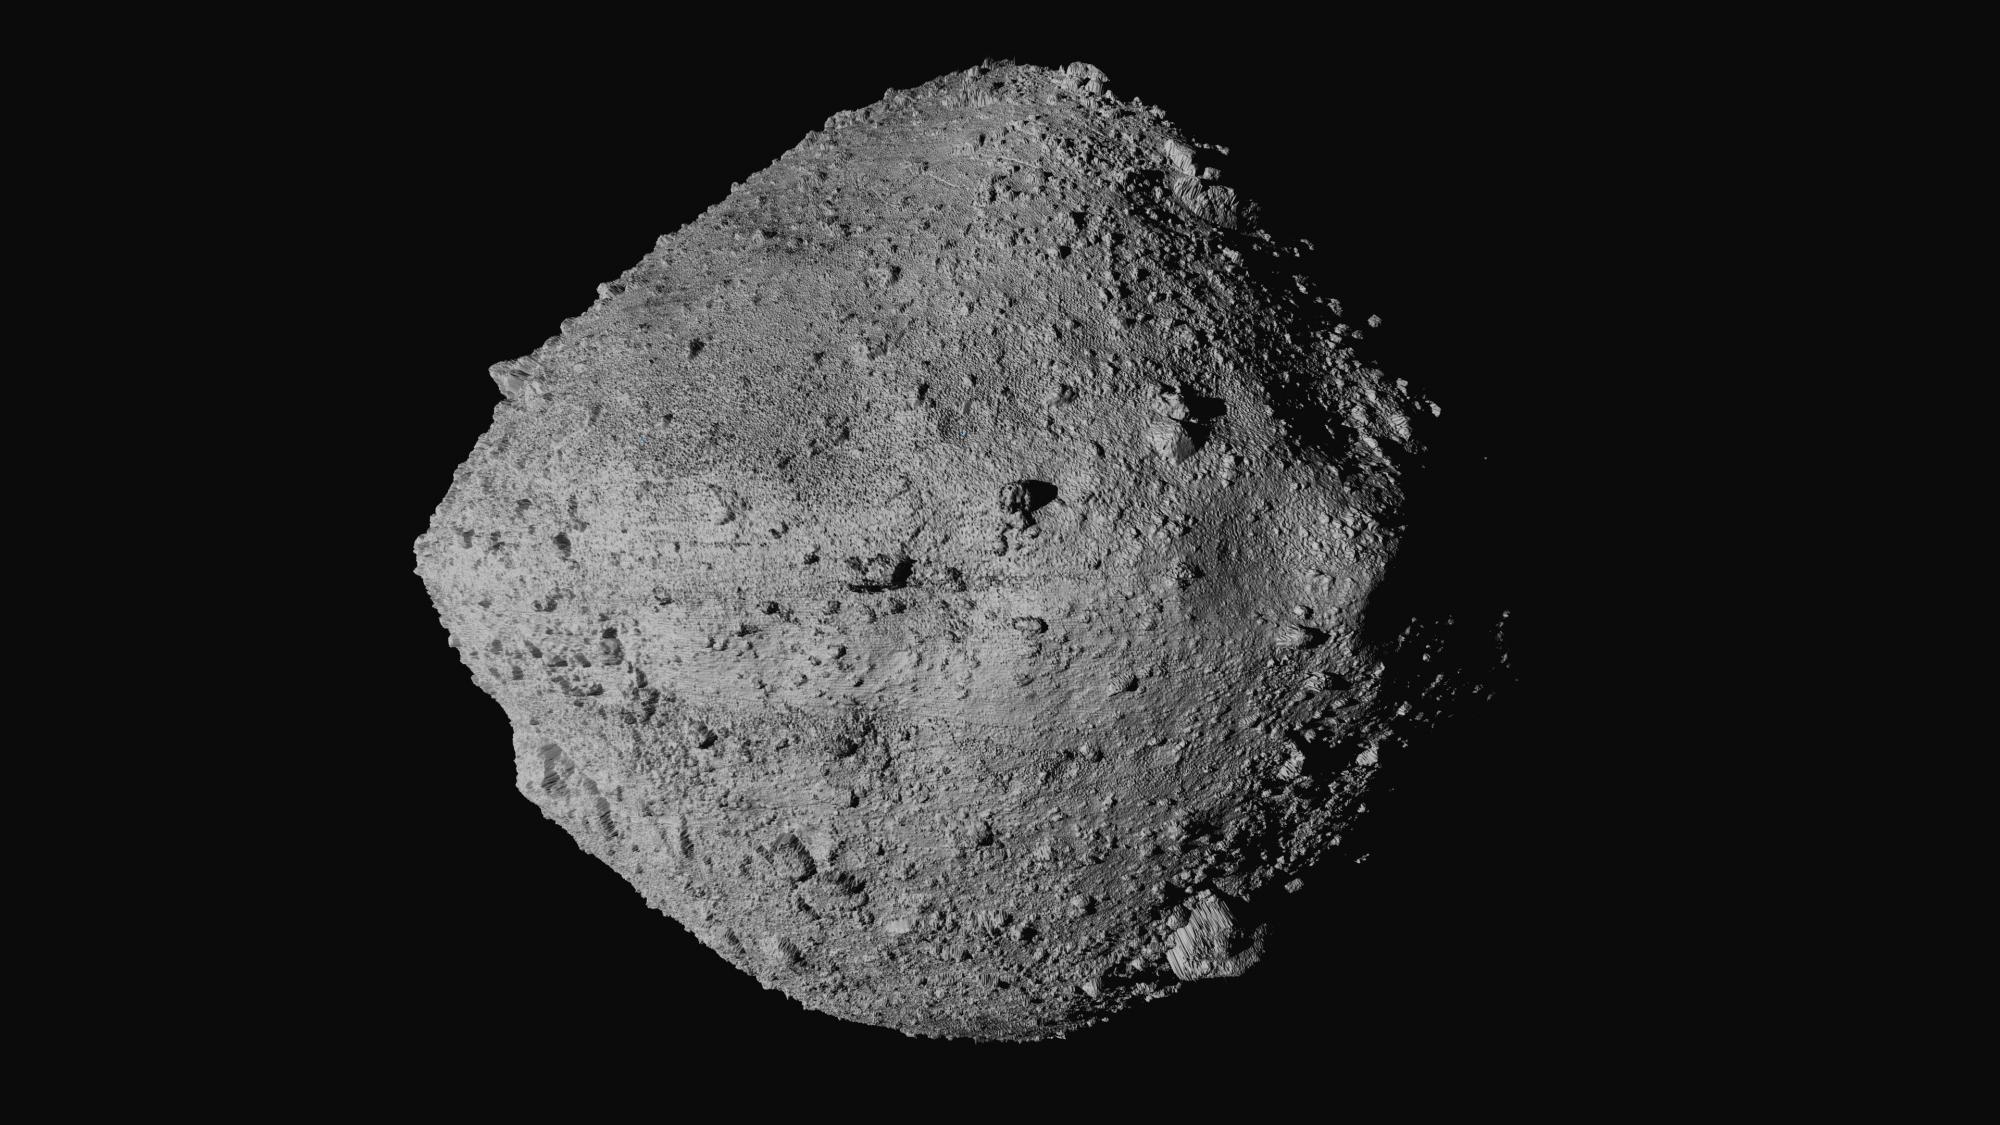 This undated image made available by NASA shows the asteroid Bennu from the OSIRIS-REx spacecraft. (NASA/Goddard/University of Arizona/CSA/York/MDA via Associated Press)